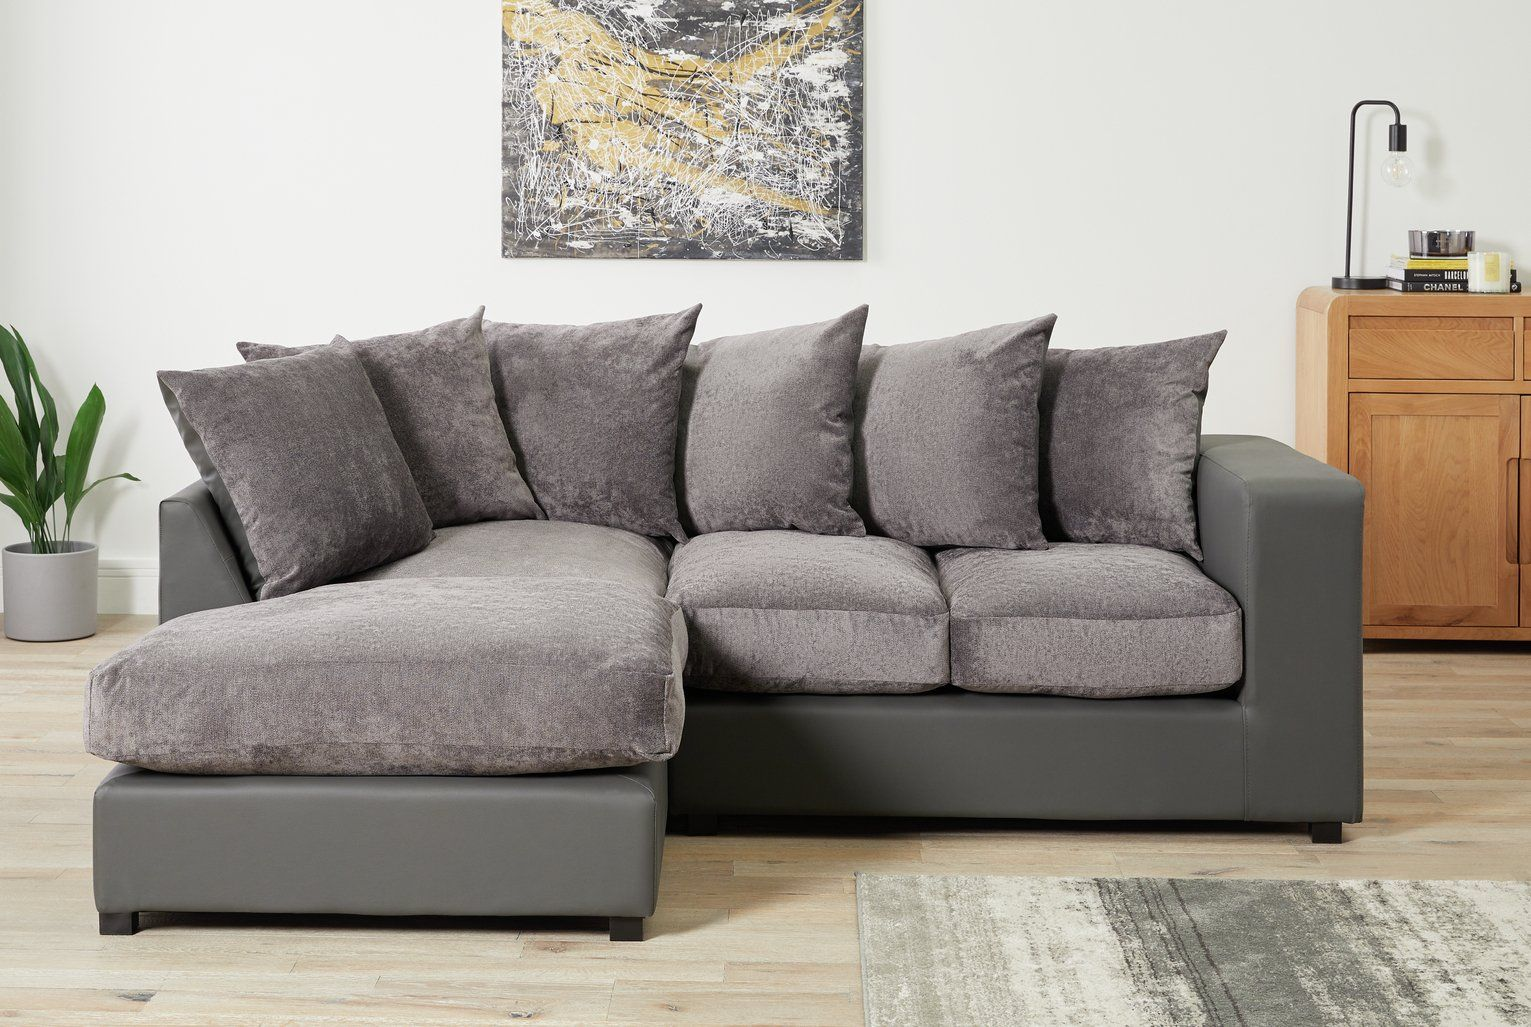 Buy Argos Home Hartley Left Corner Fabric Sofa Charcoal Sofas Argos In 2020 Argos Home Fabric Sofa Corner Sofa